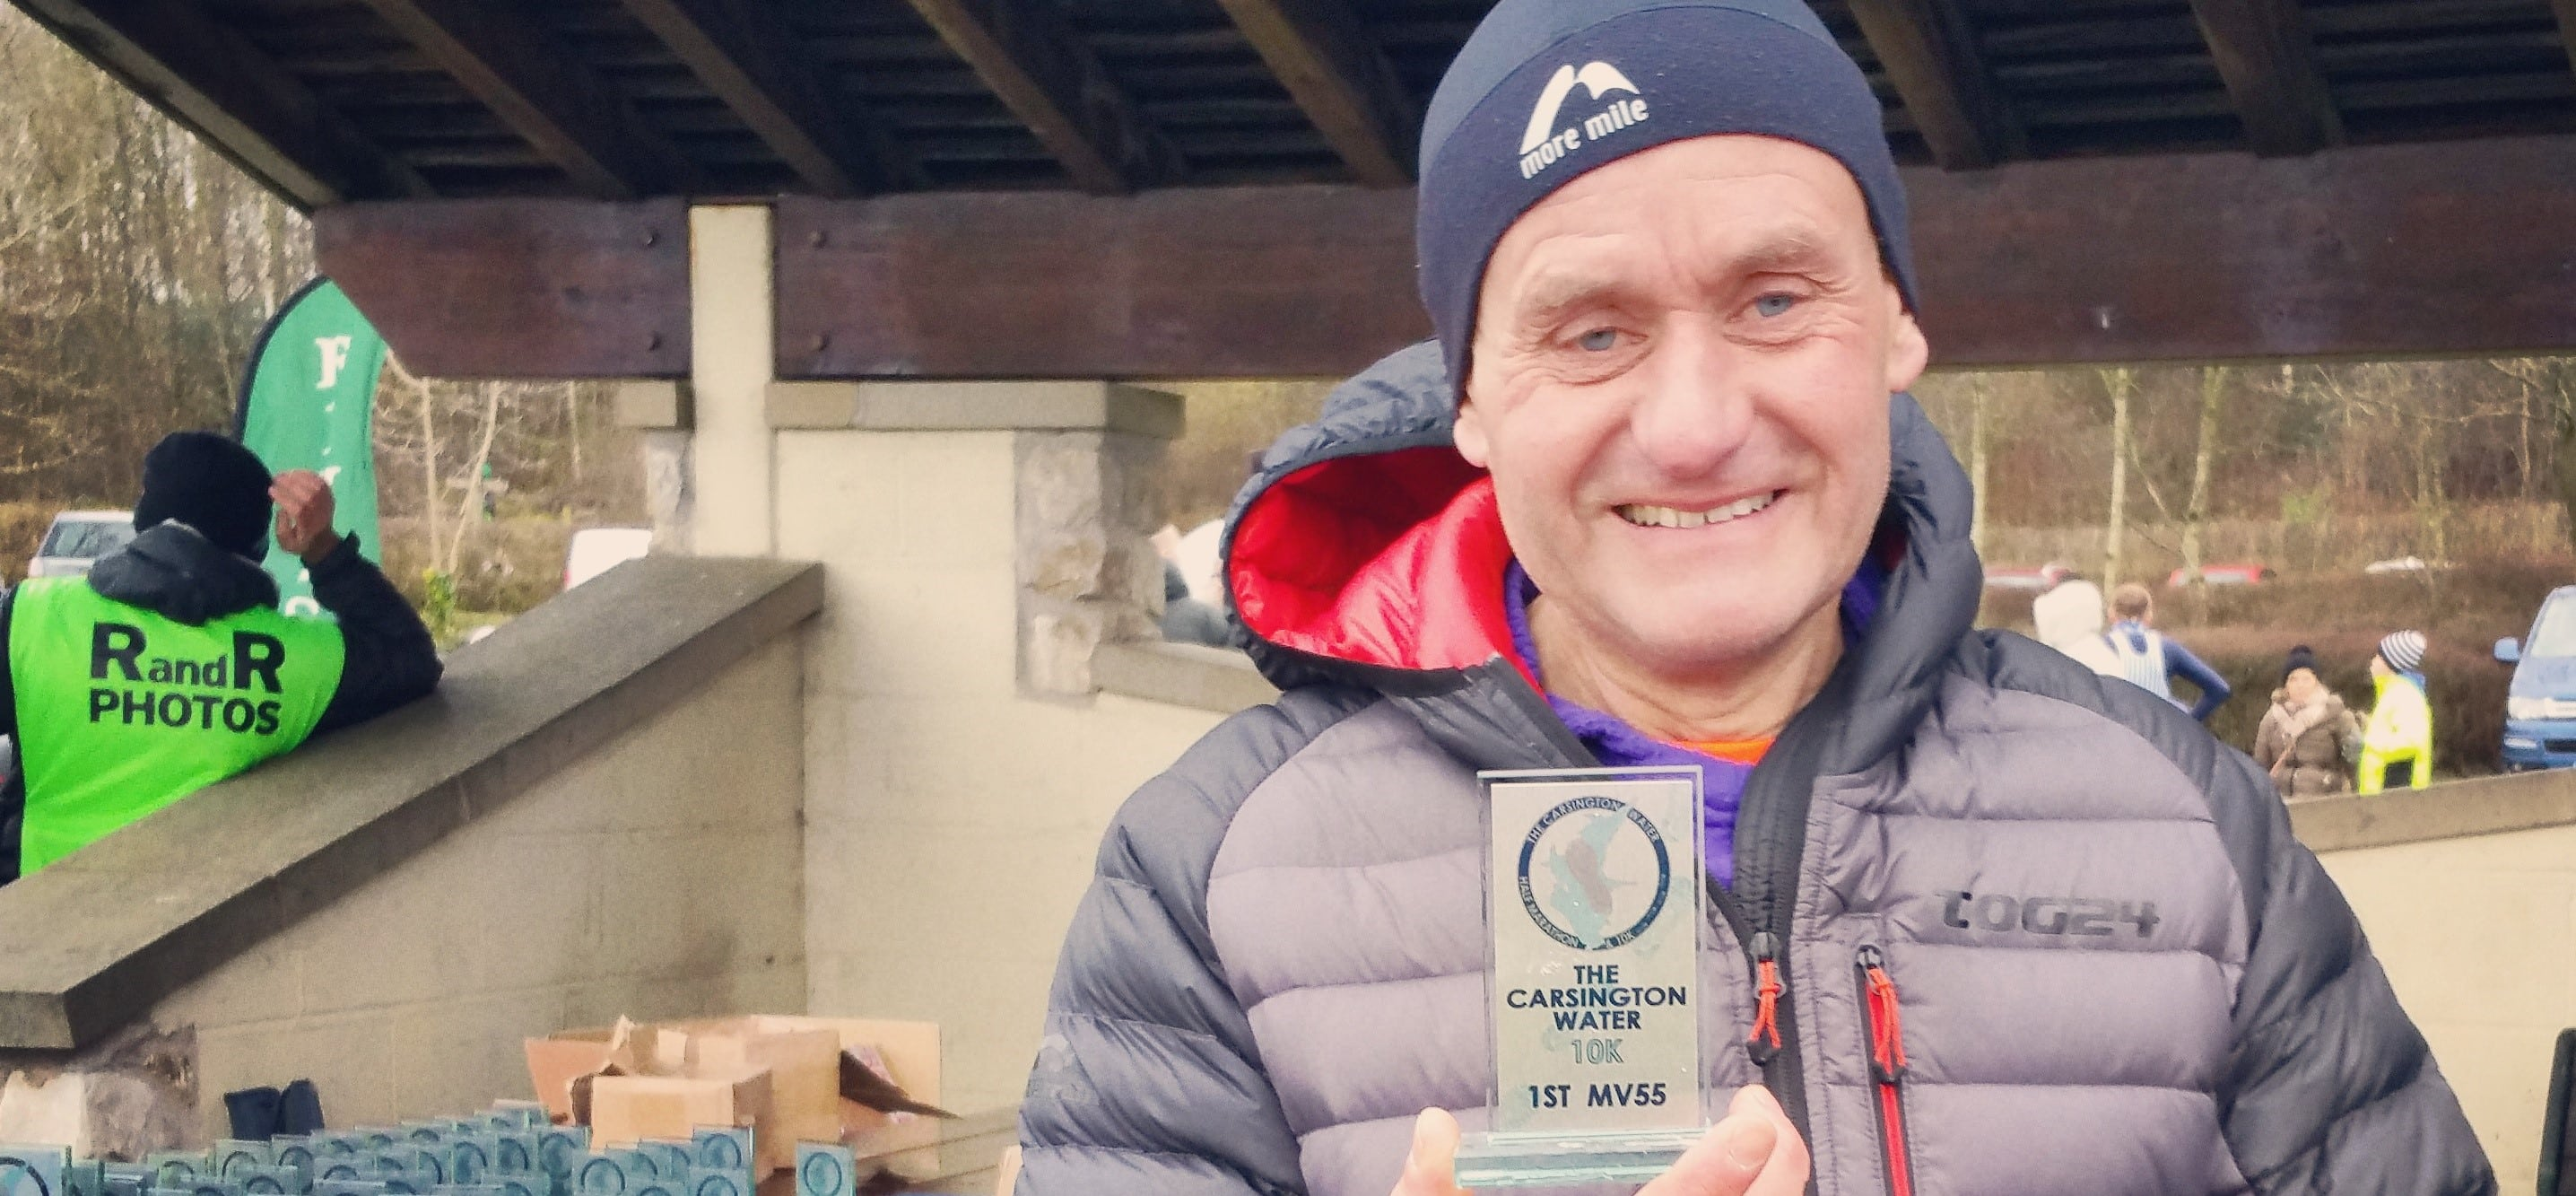 Carsington Water Half Marathon and 10k